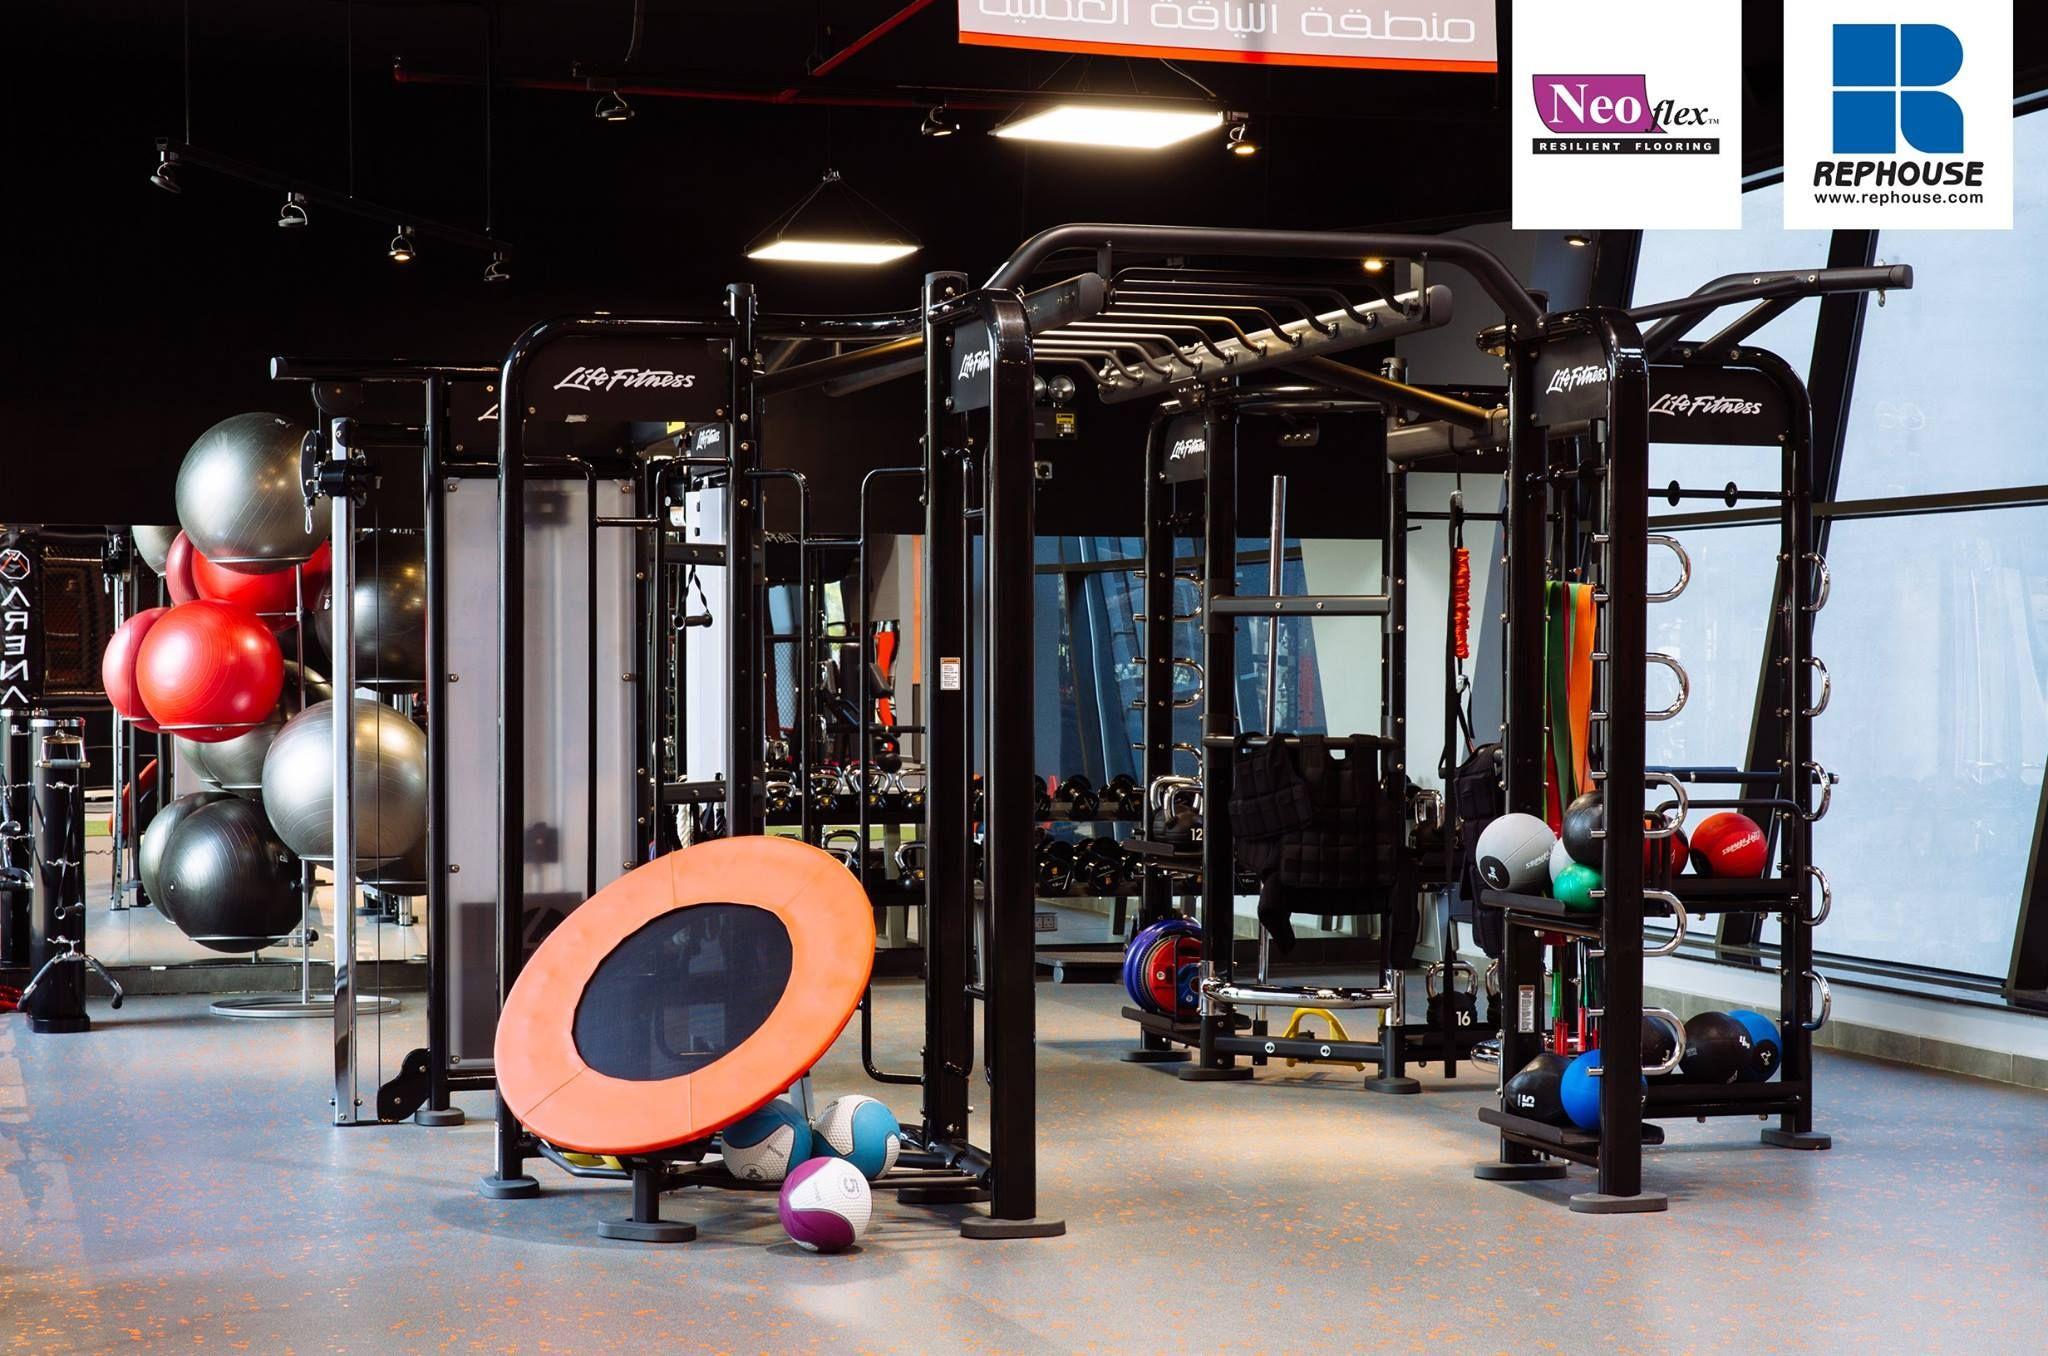 Neoflex 600 Series BFC Rubber Fitness Flooring @ Arena Saudi